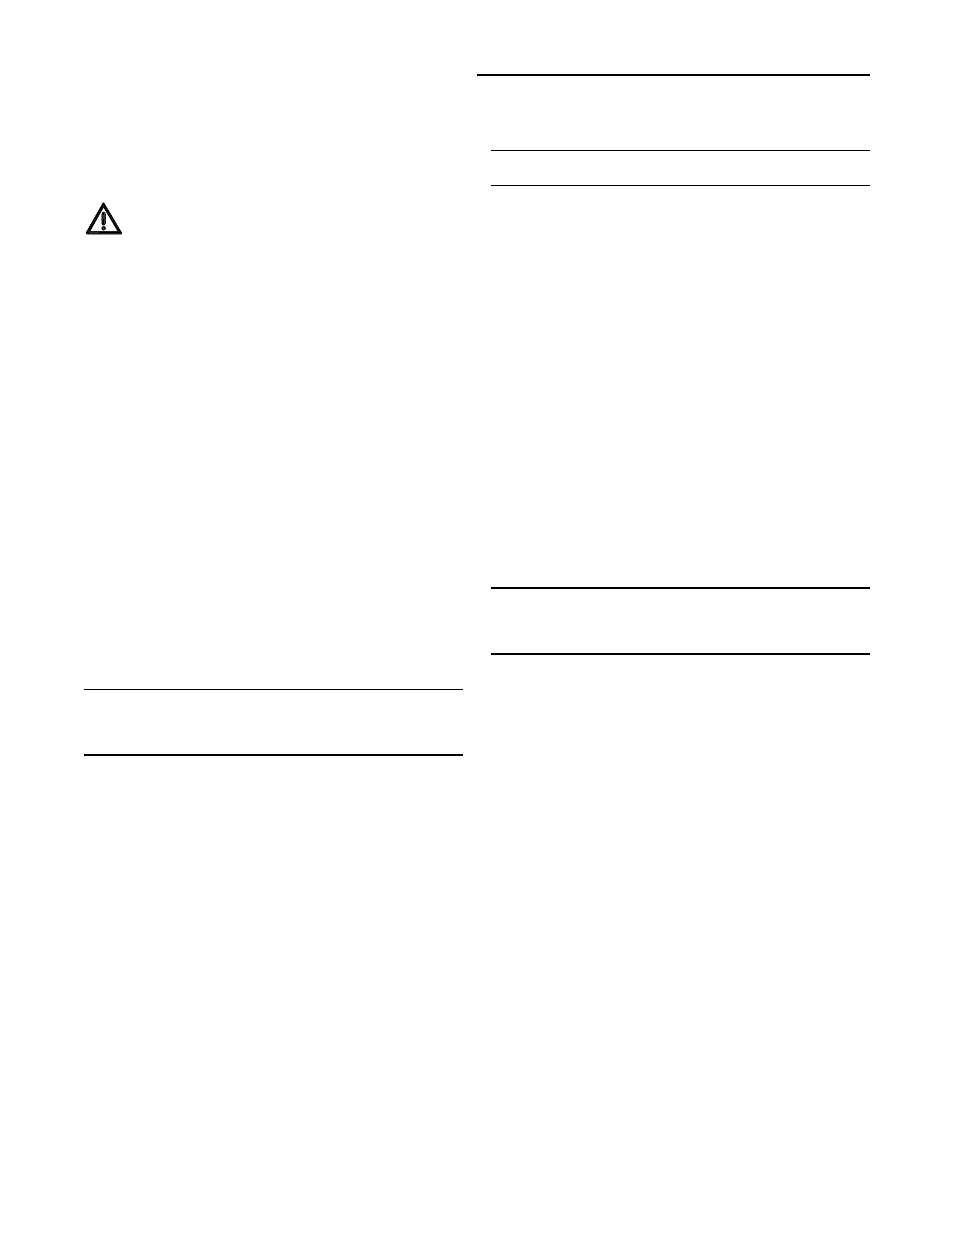 Trane intellipak rooftop unit manual